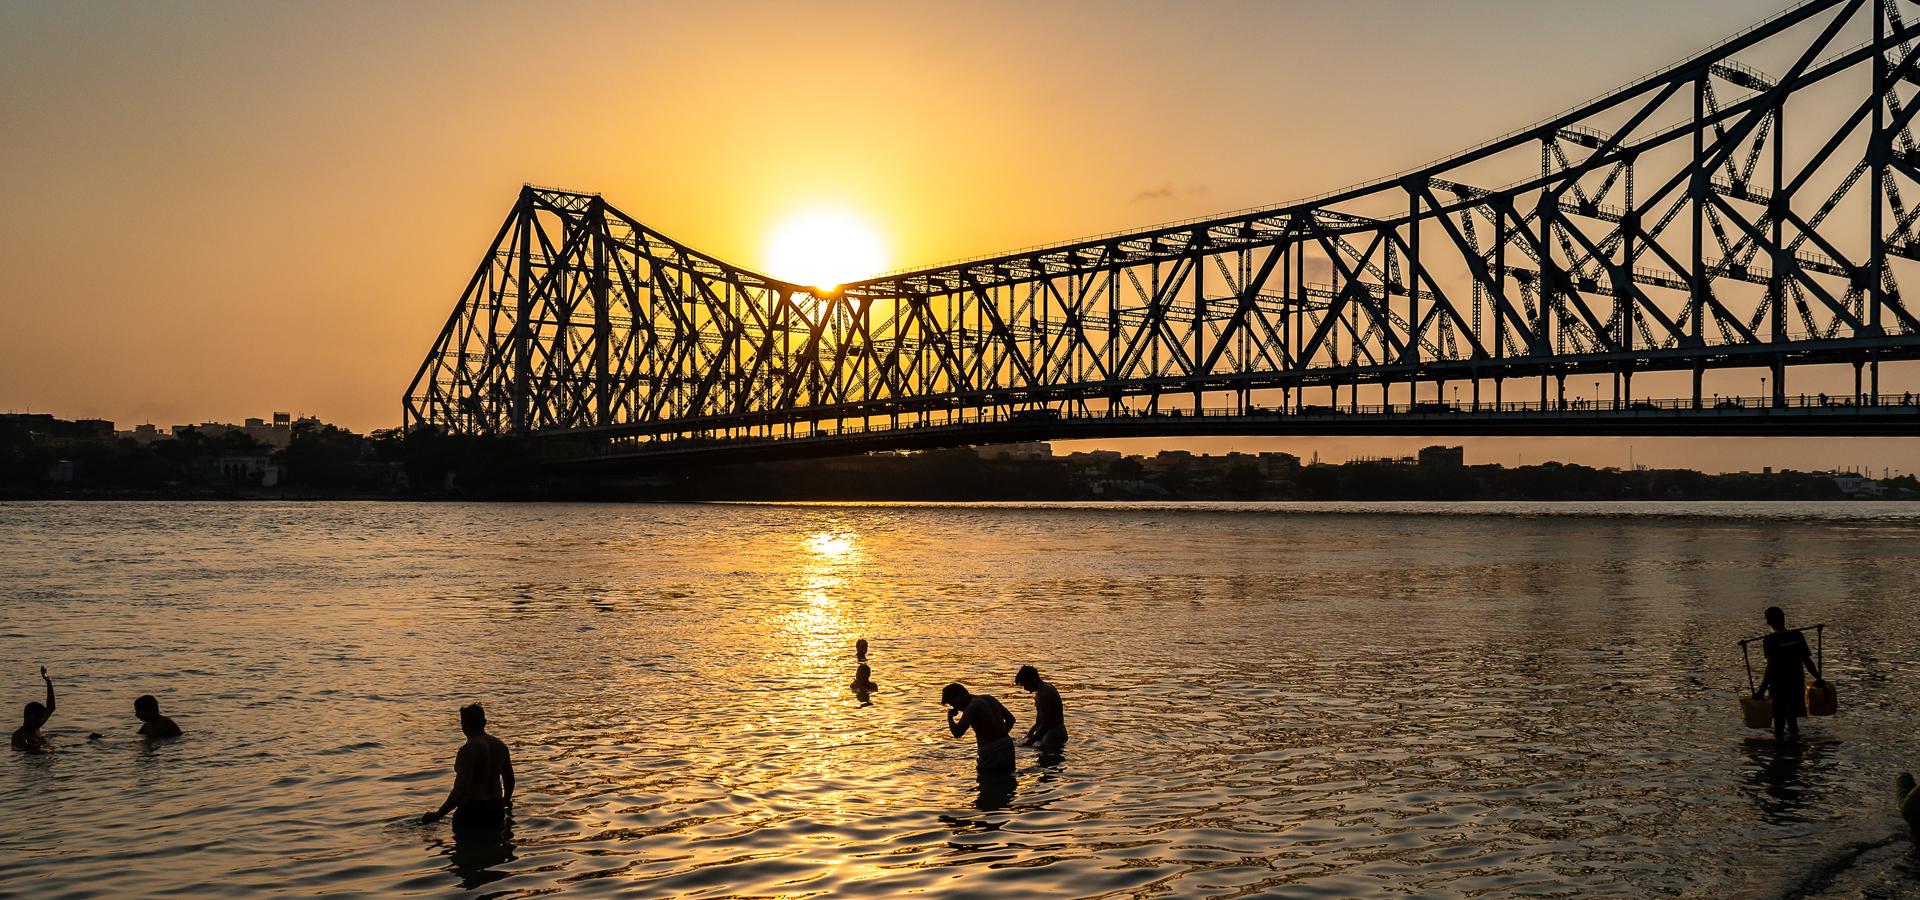 Peer-to-peer advisory in Kolkata, (Calcutta), West Bengal, India